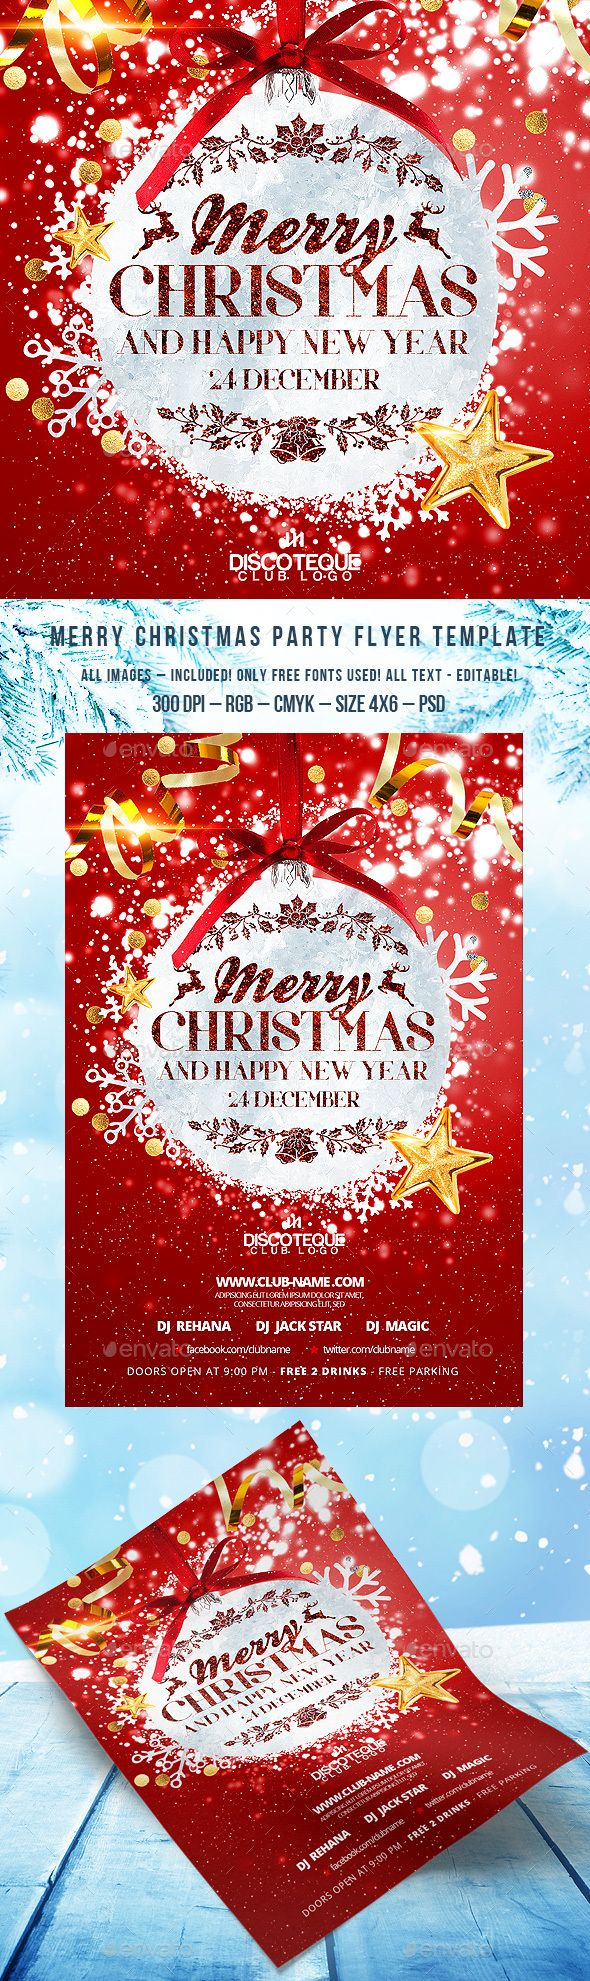 The 25+ best Free christmas flyer templates ideas on Pinterest ...